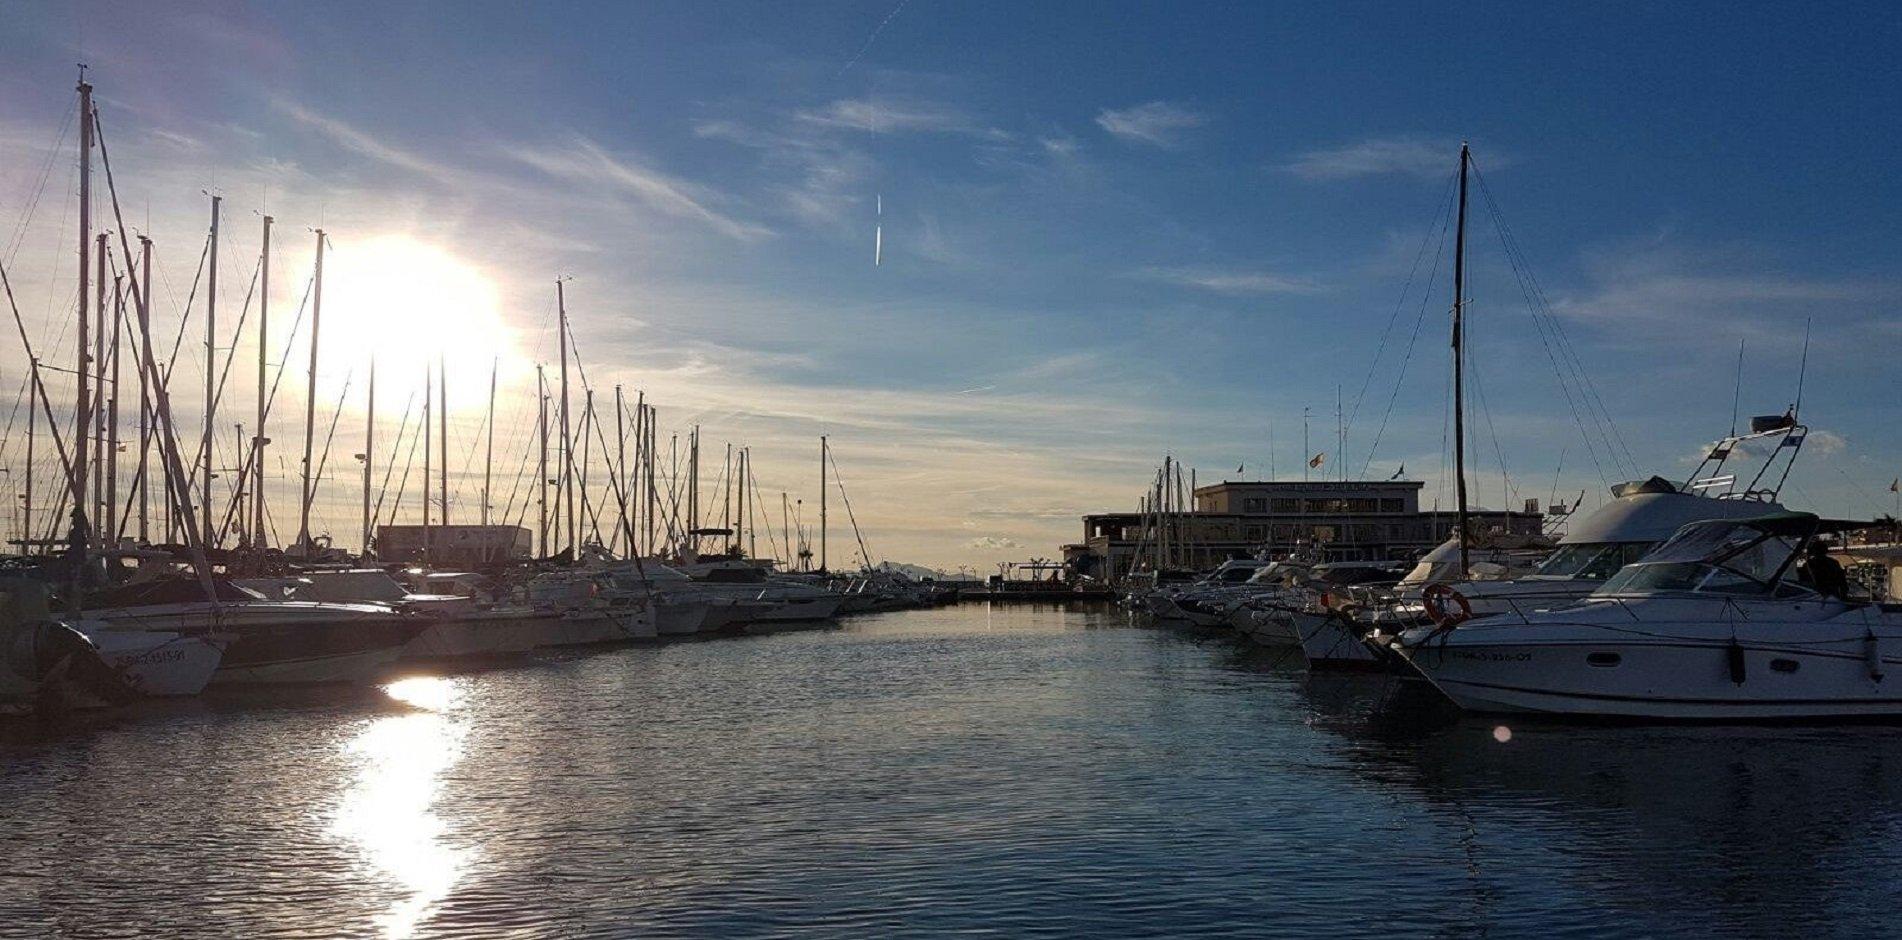 Puerto deportivo Marina Miramar, Santa Pola